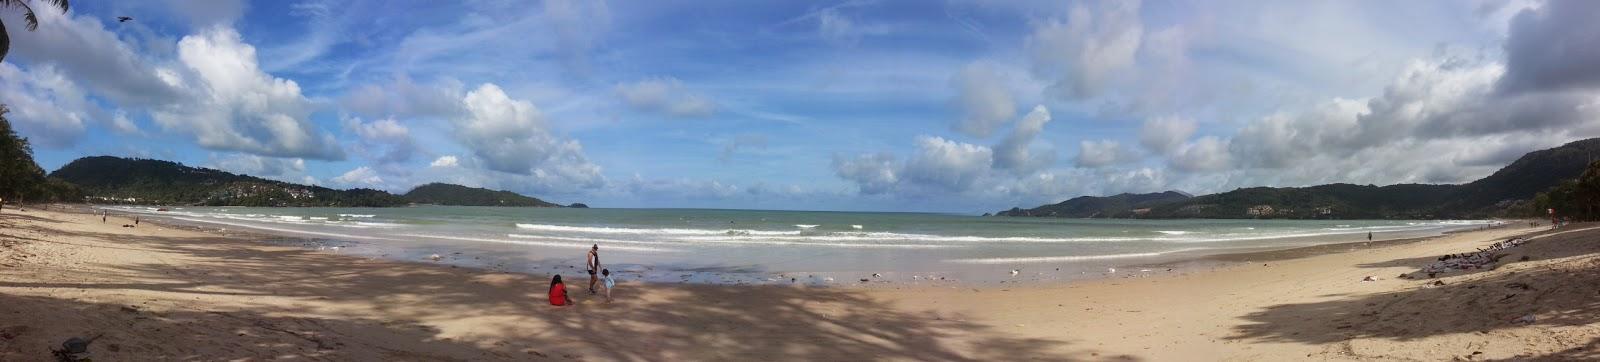 Image of Patong Beach - Phuket